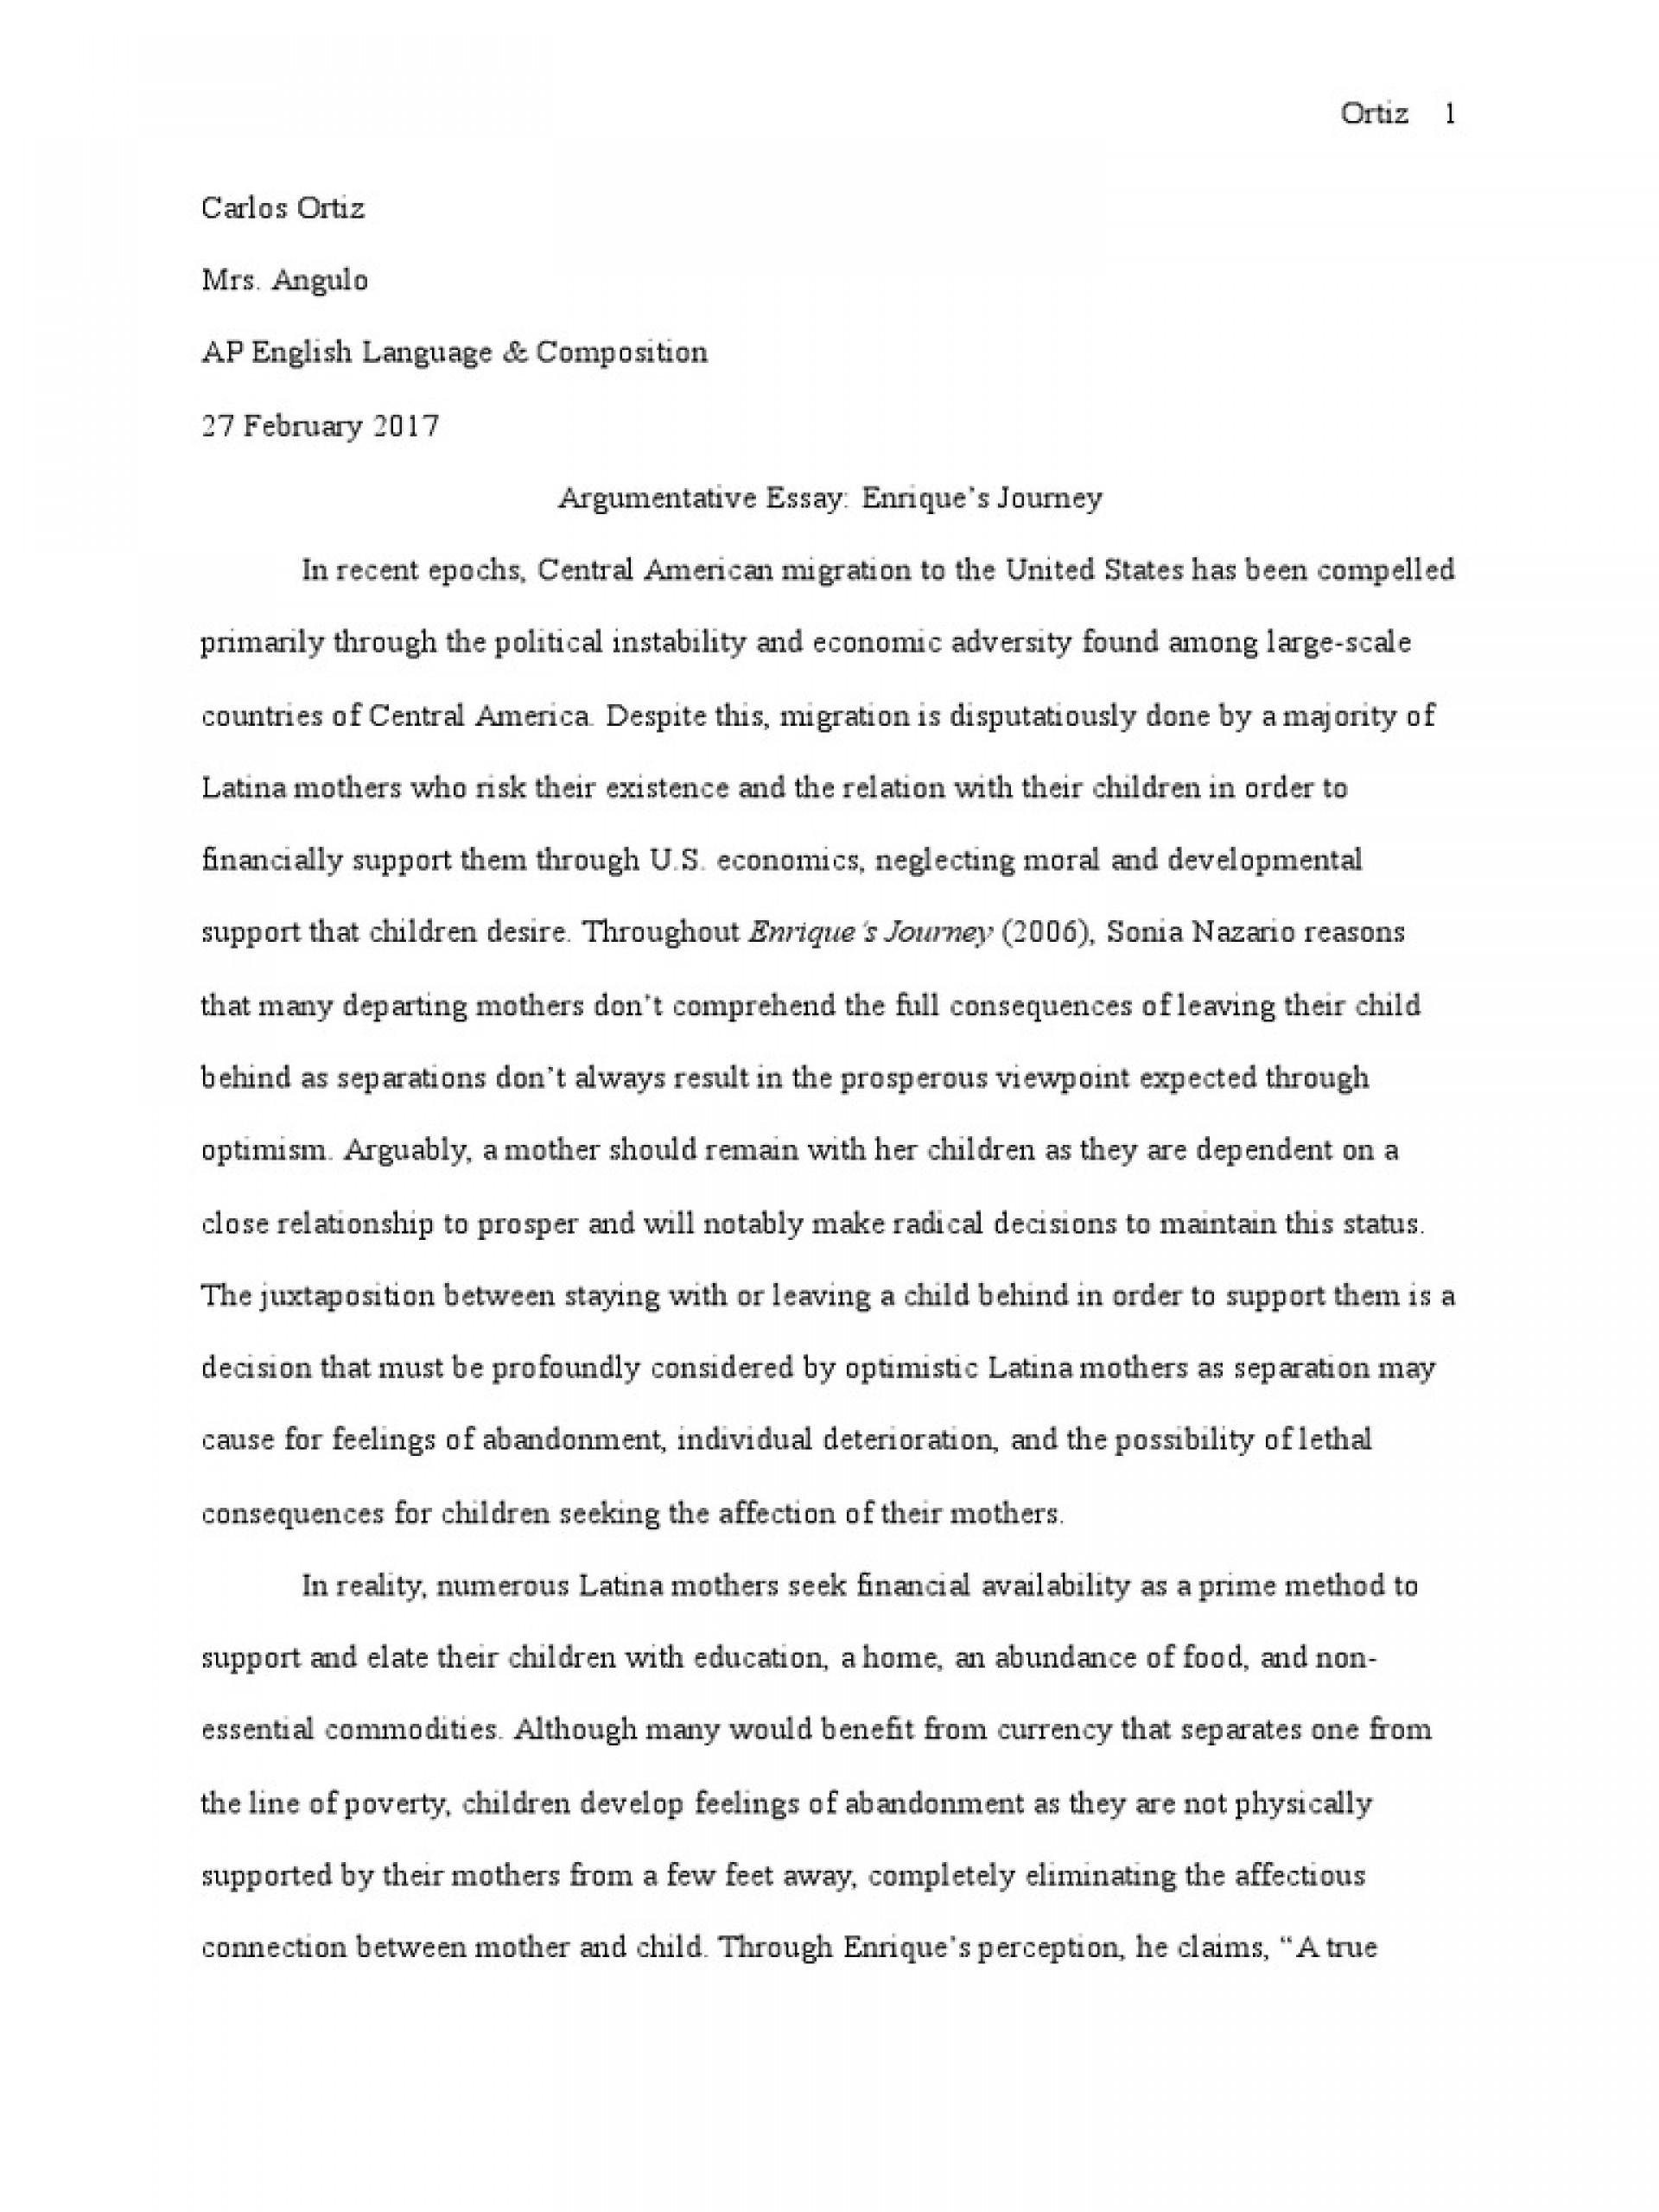 025 Argumentative Essay Enriques Journey Adolescence Substance Abuse On Social Media Pdf Unique Rubric High School Writing Sample 1920